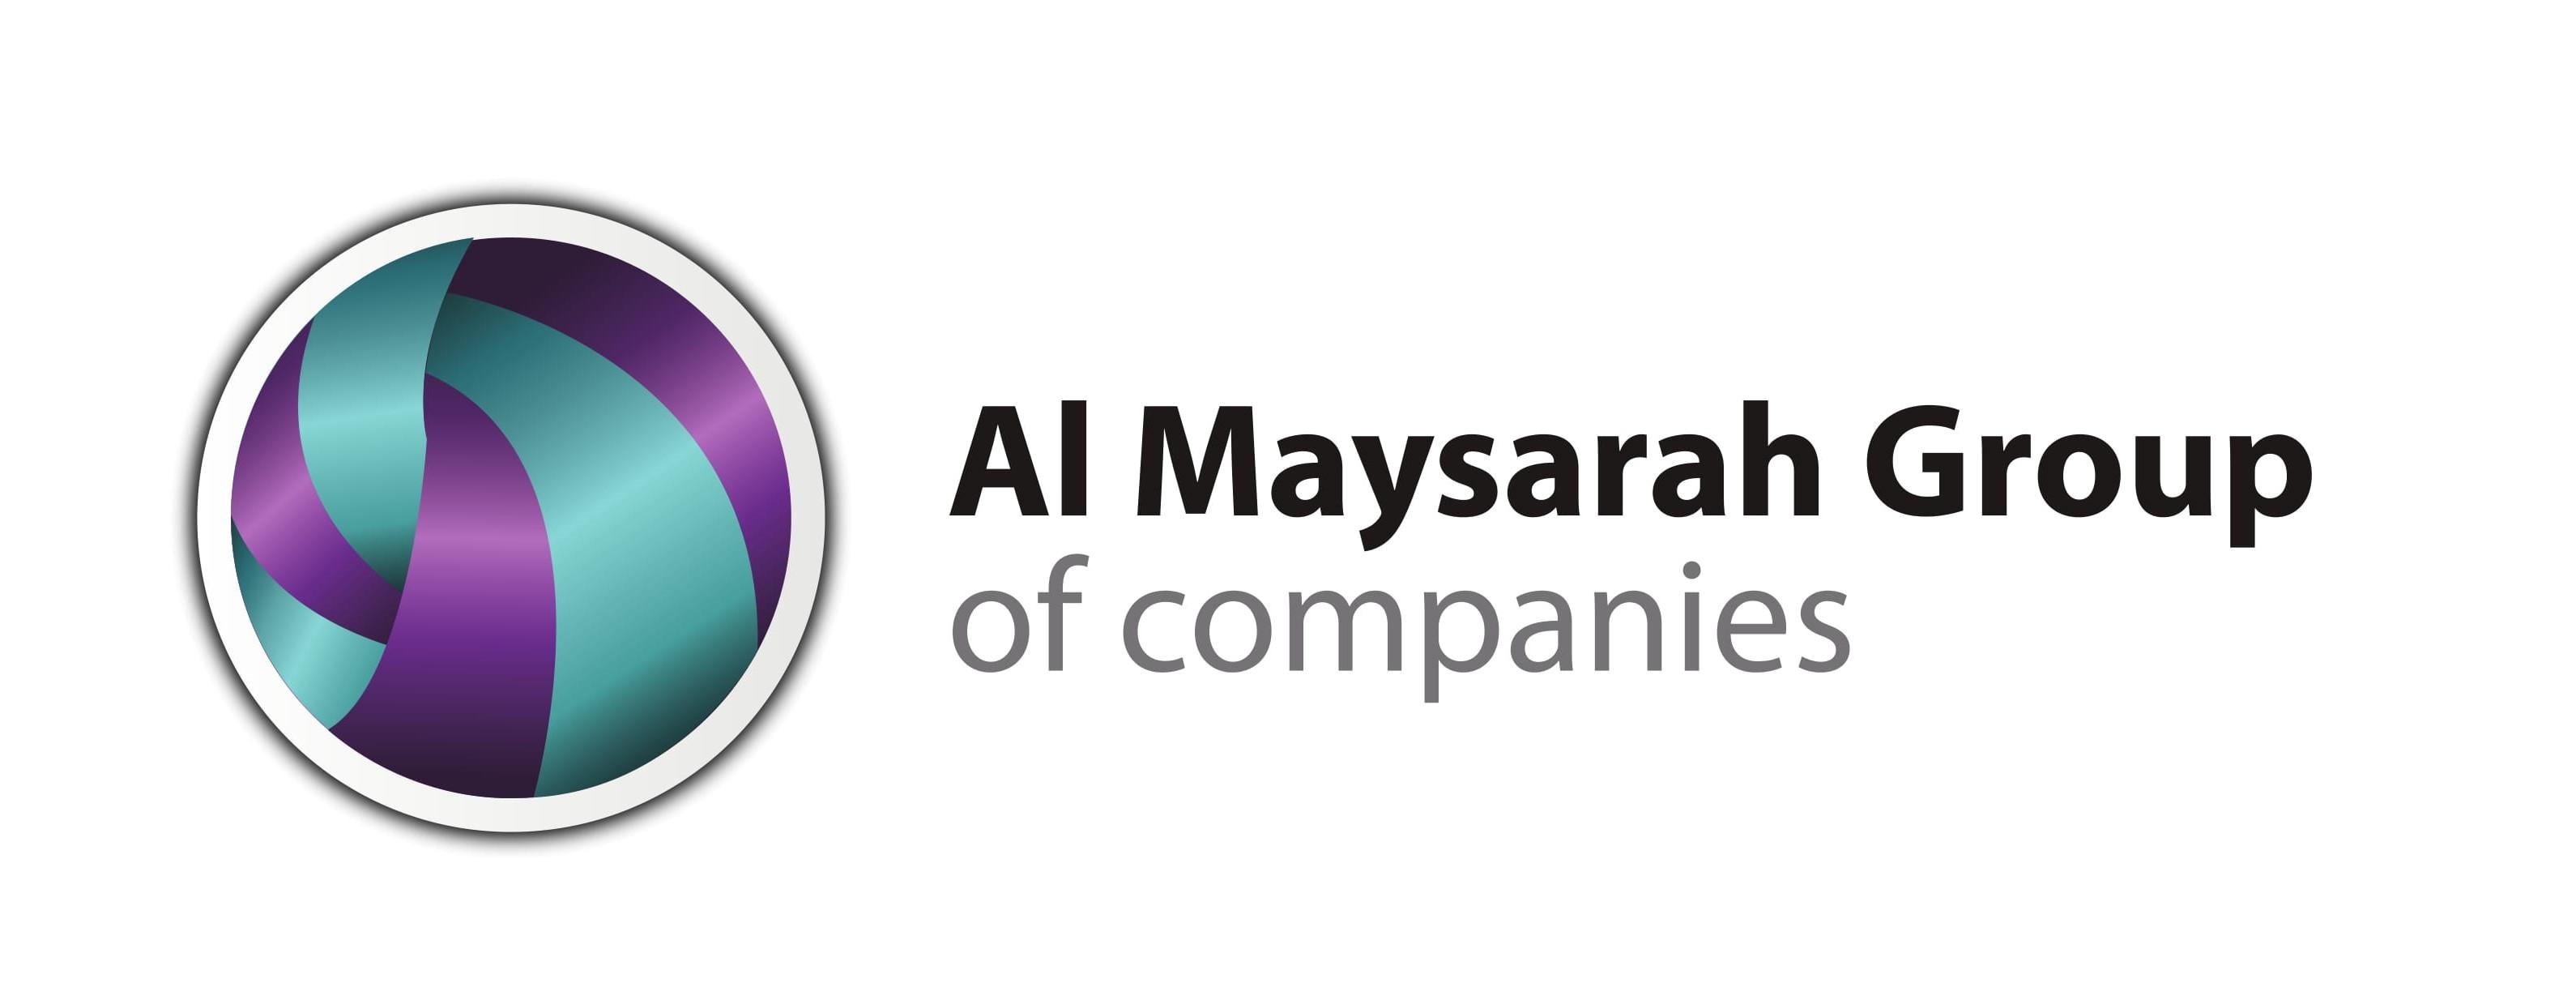 Al Maysarah Group